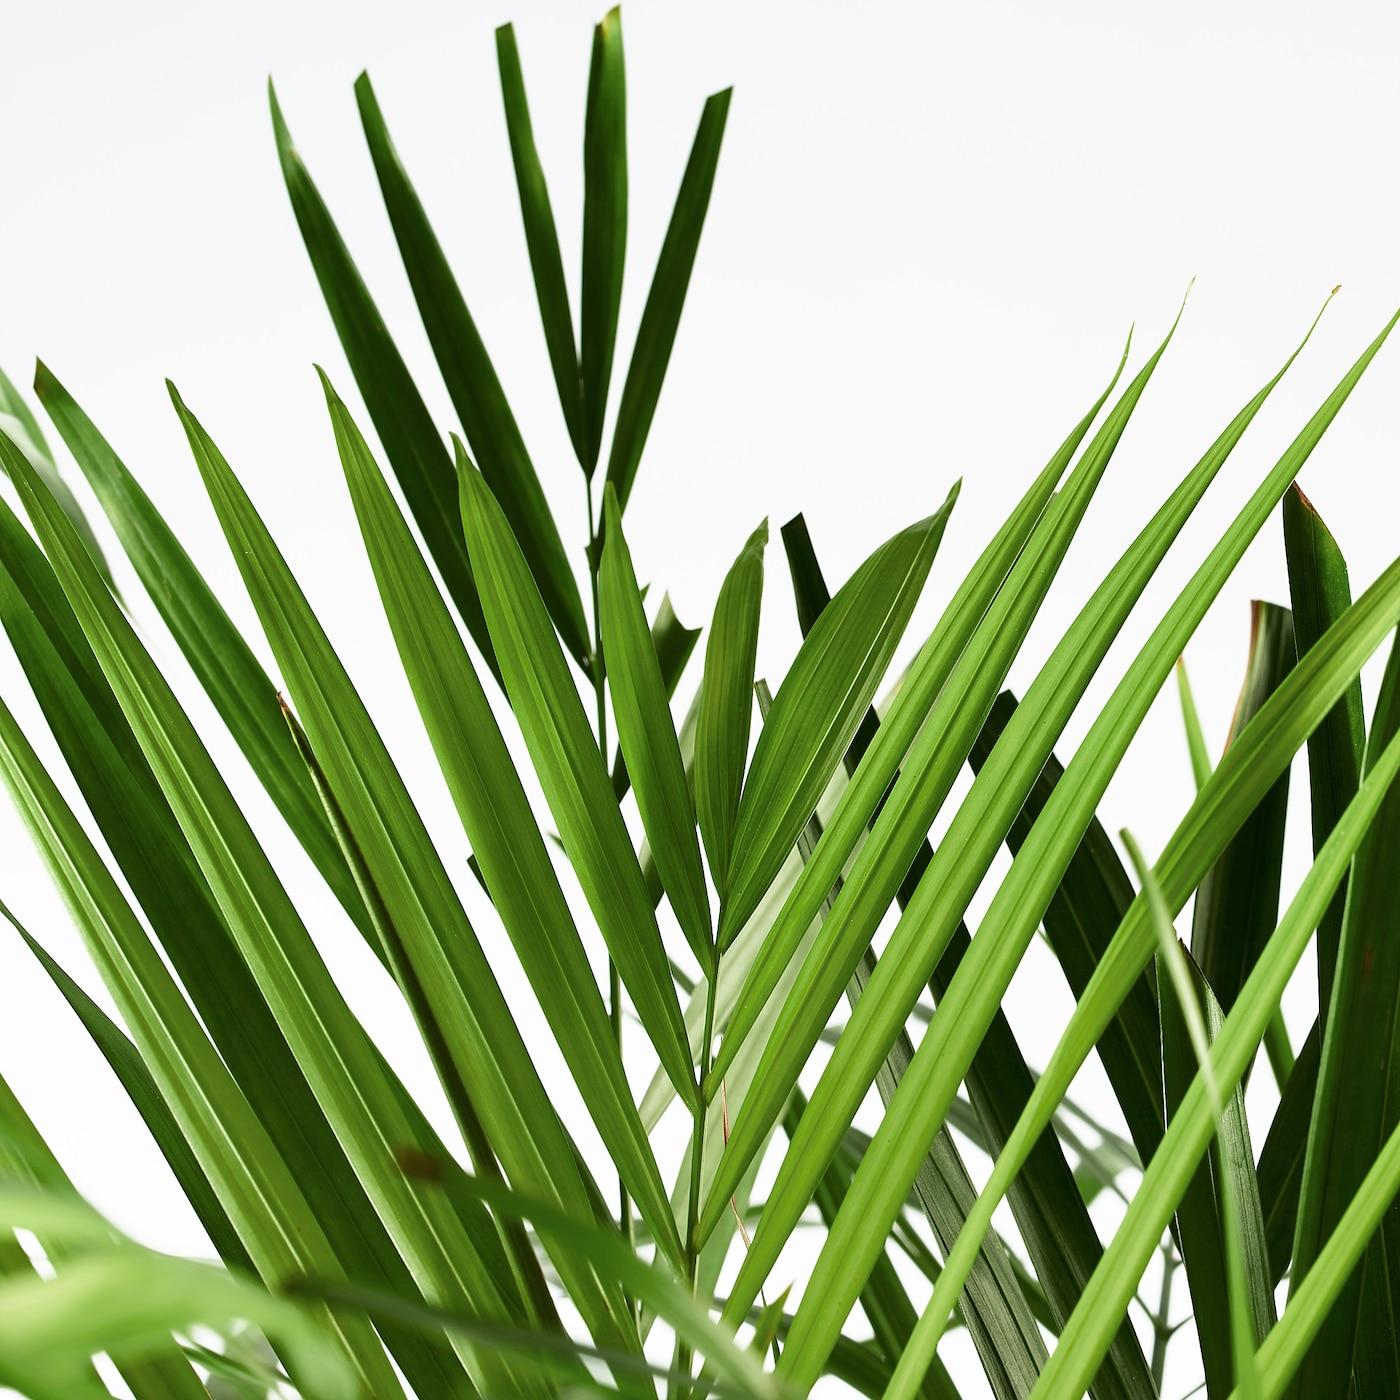 DYPSIS LUTESCENS Planta chrysalidocarpus lutescens 24 cm